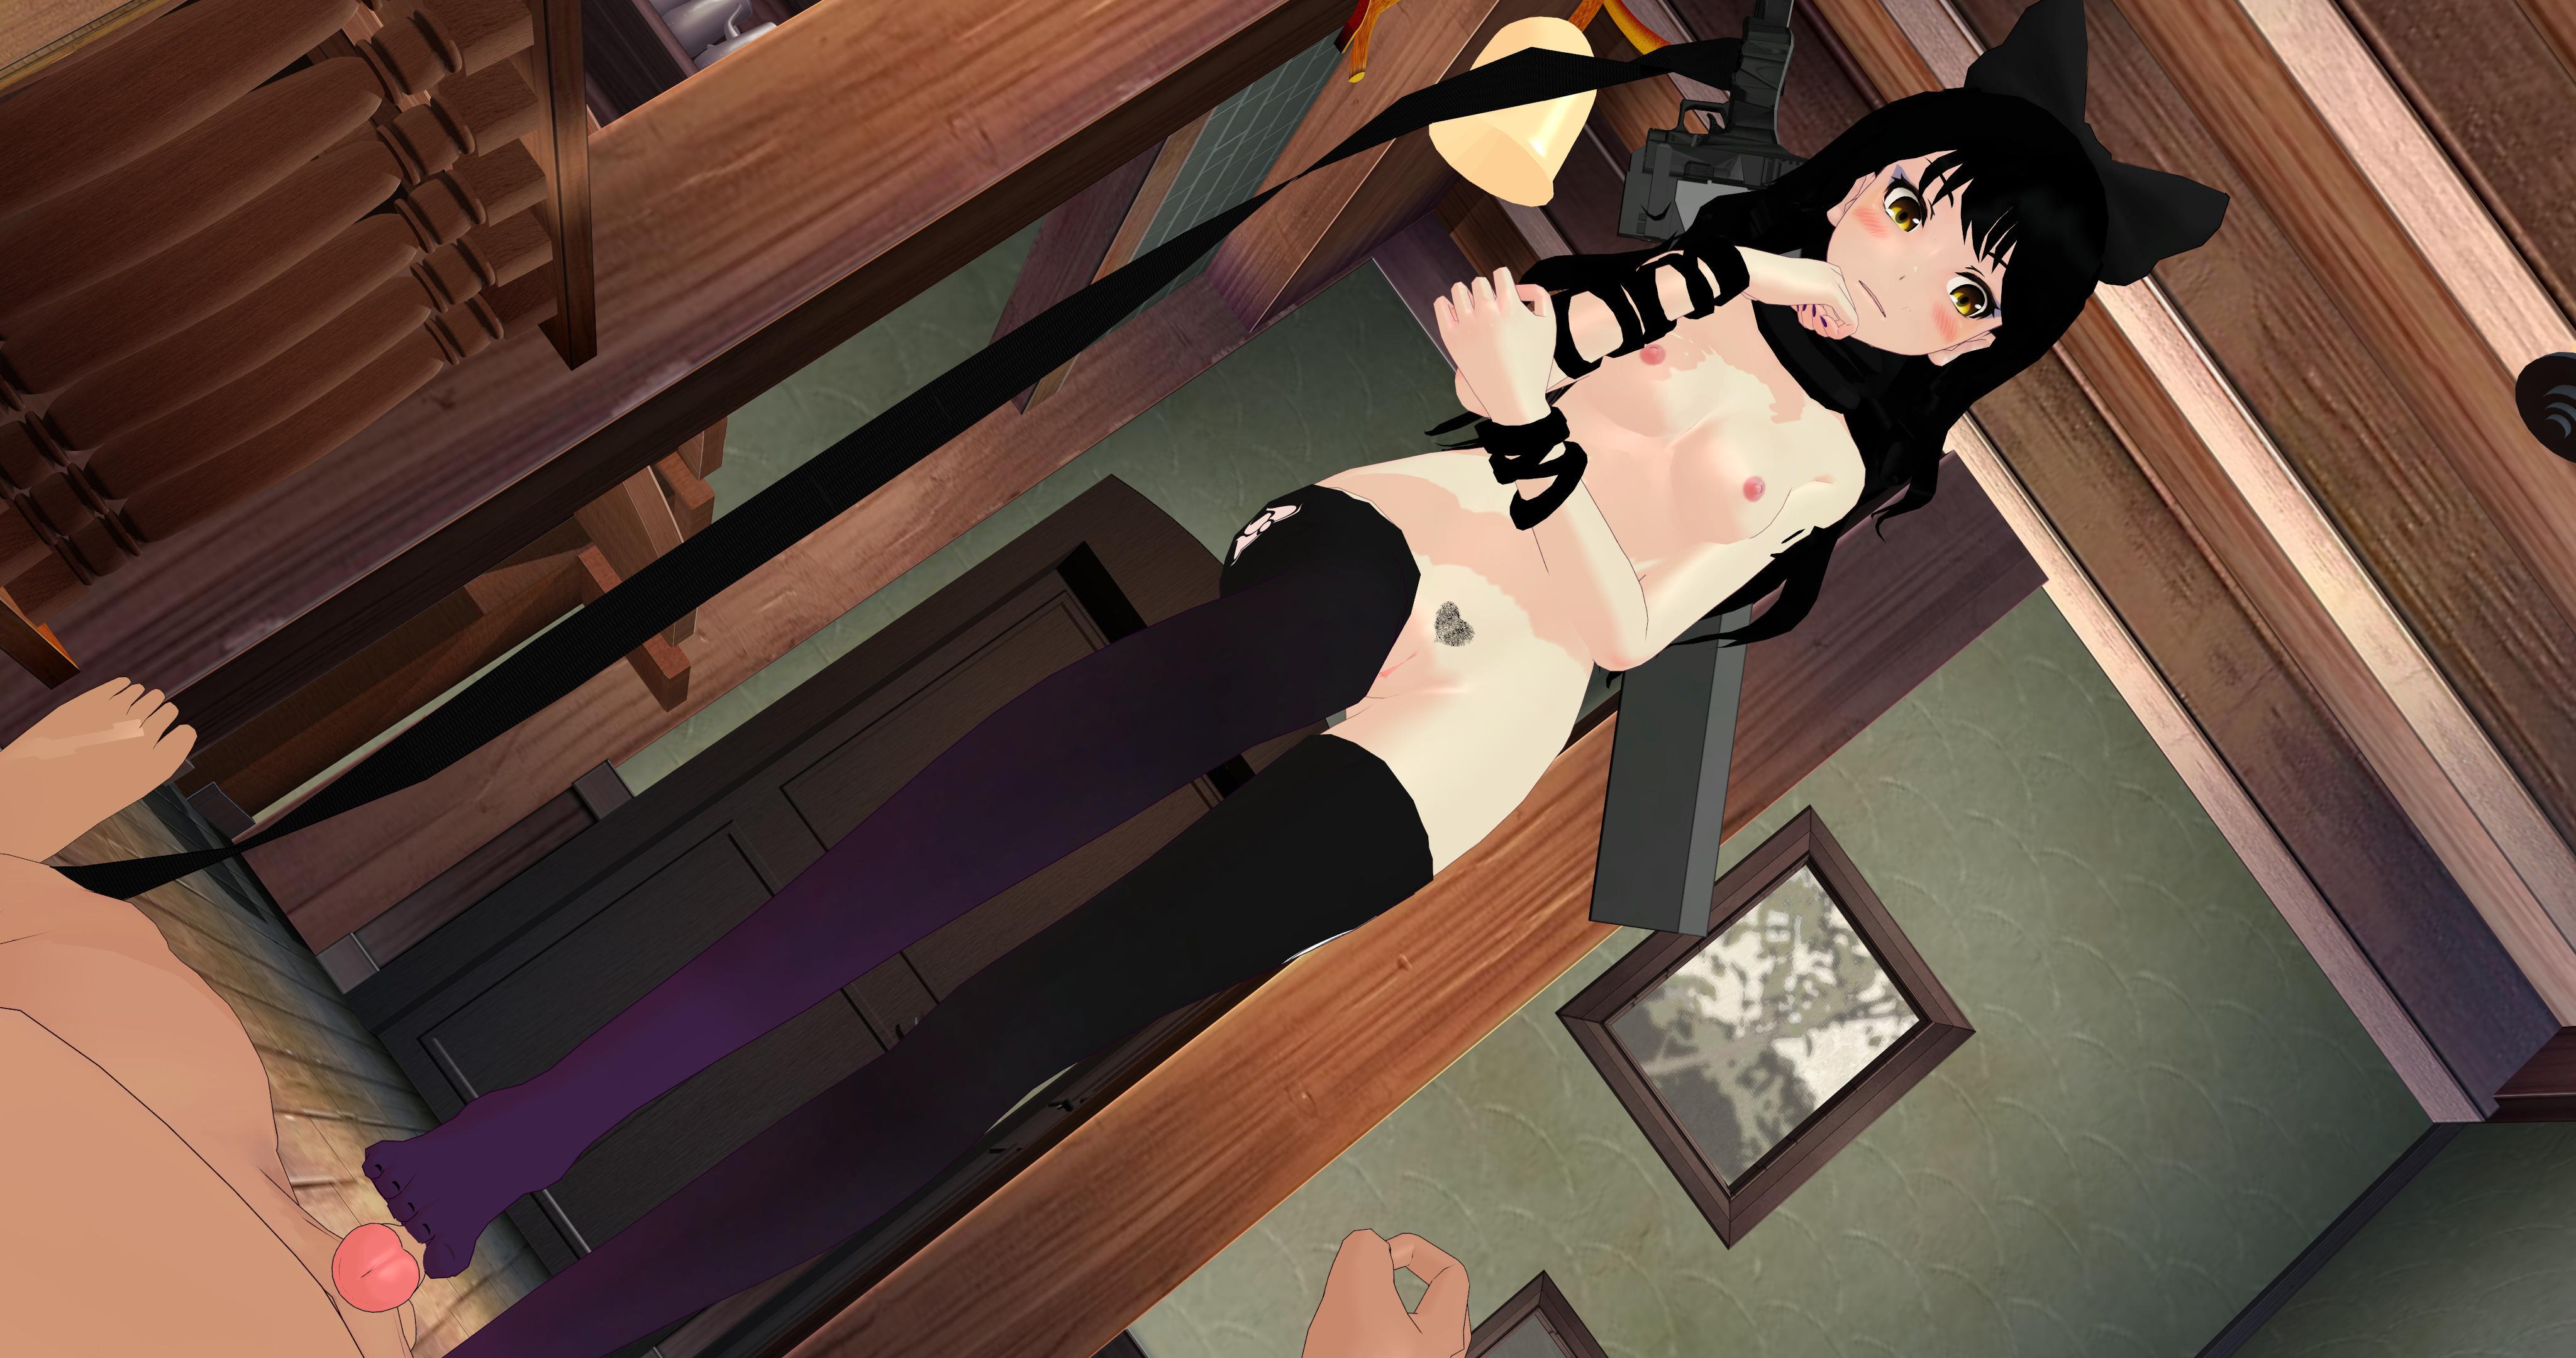 maga sex footjob - ... RWBY - Blake Footjob Lewd FRAGGY HentaiGirl VR porn video vrporn.com ...